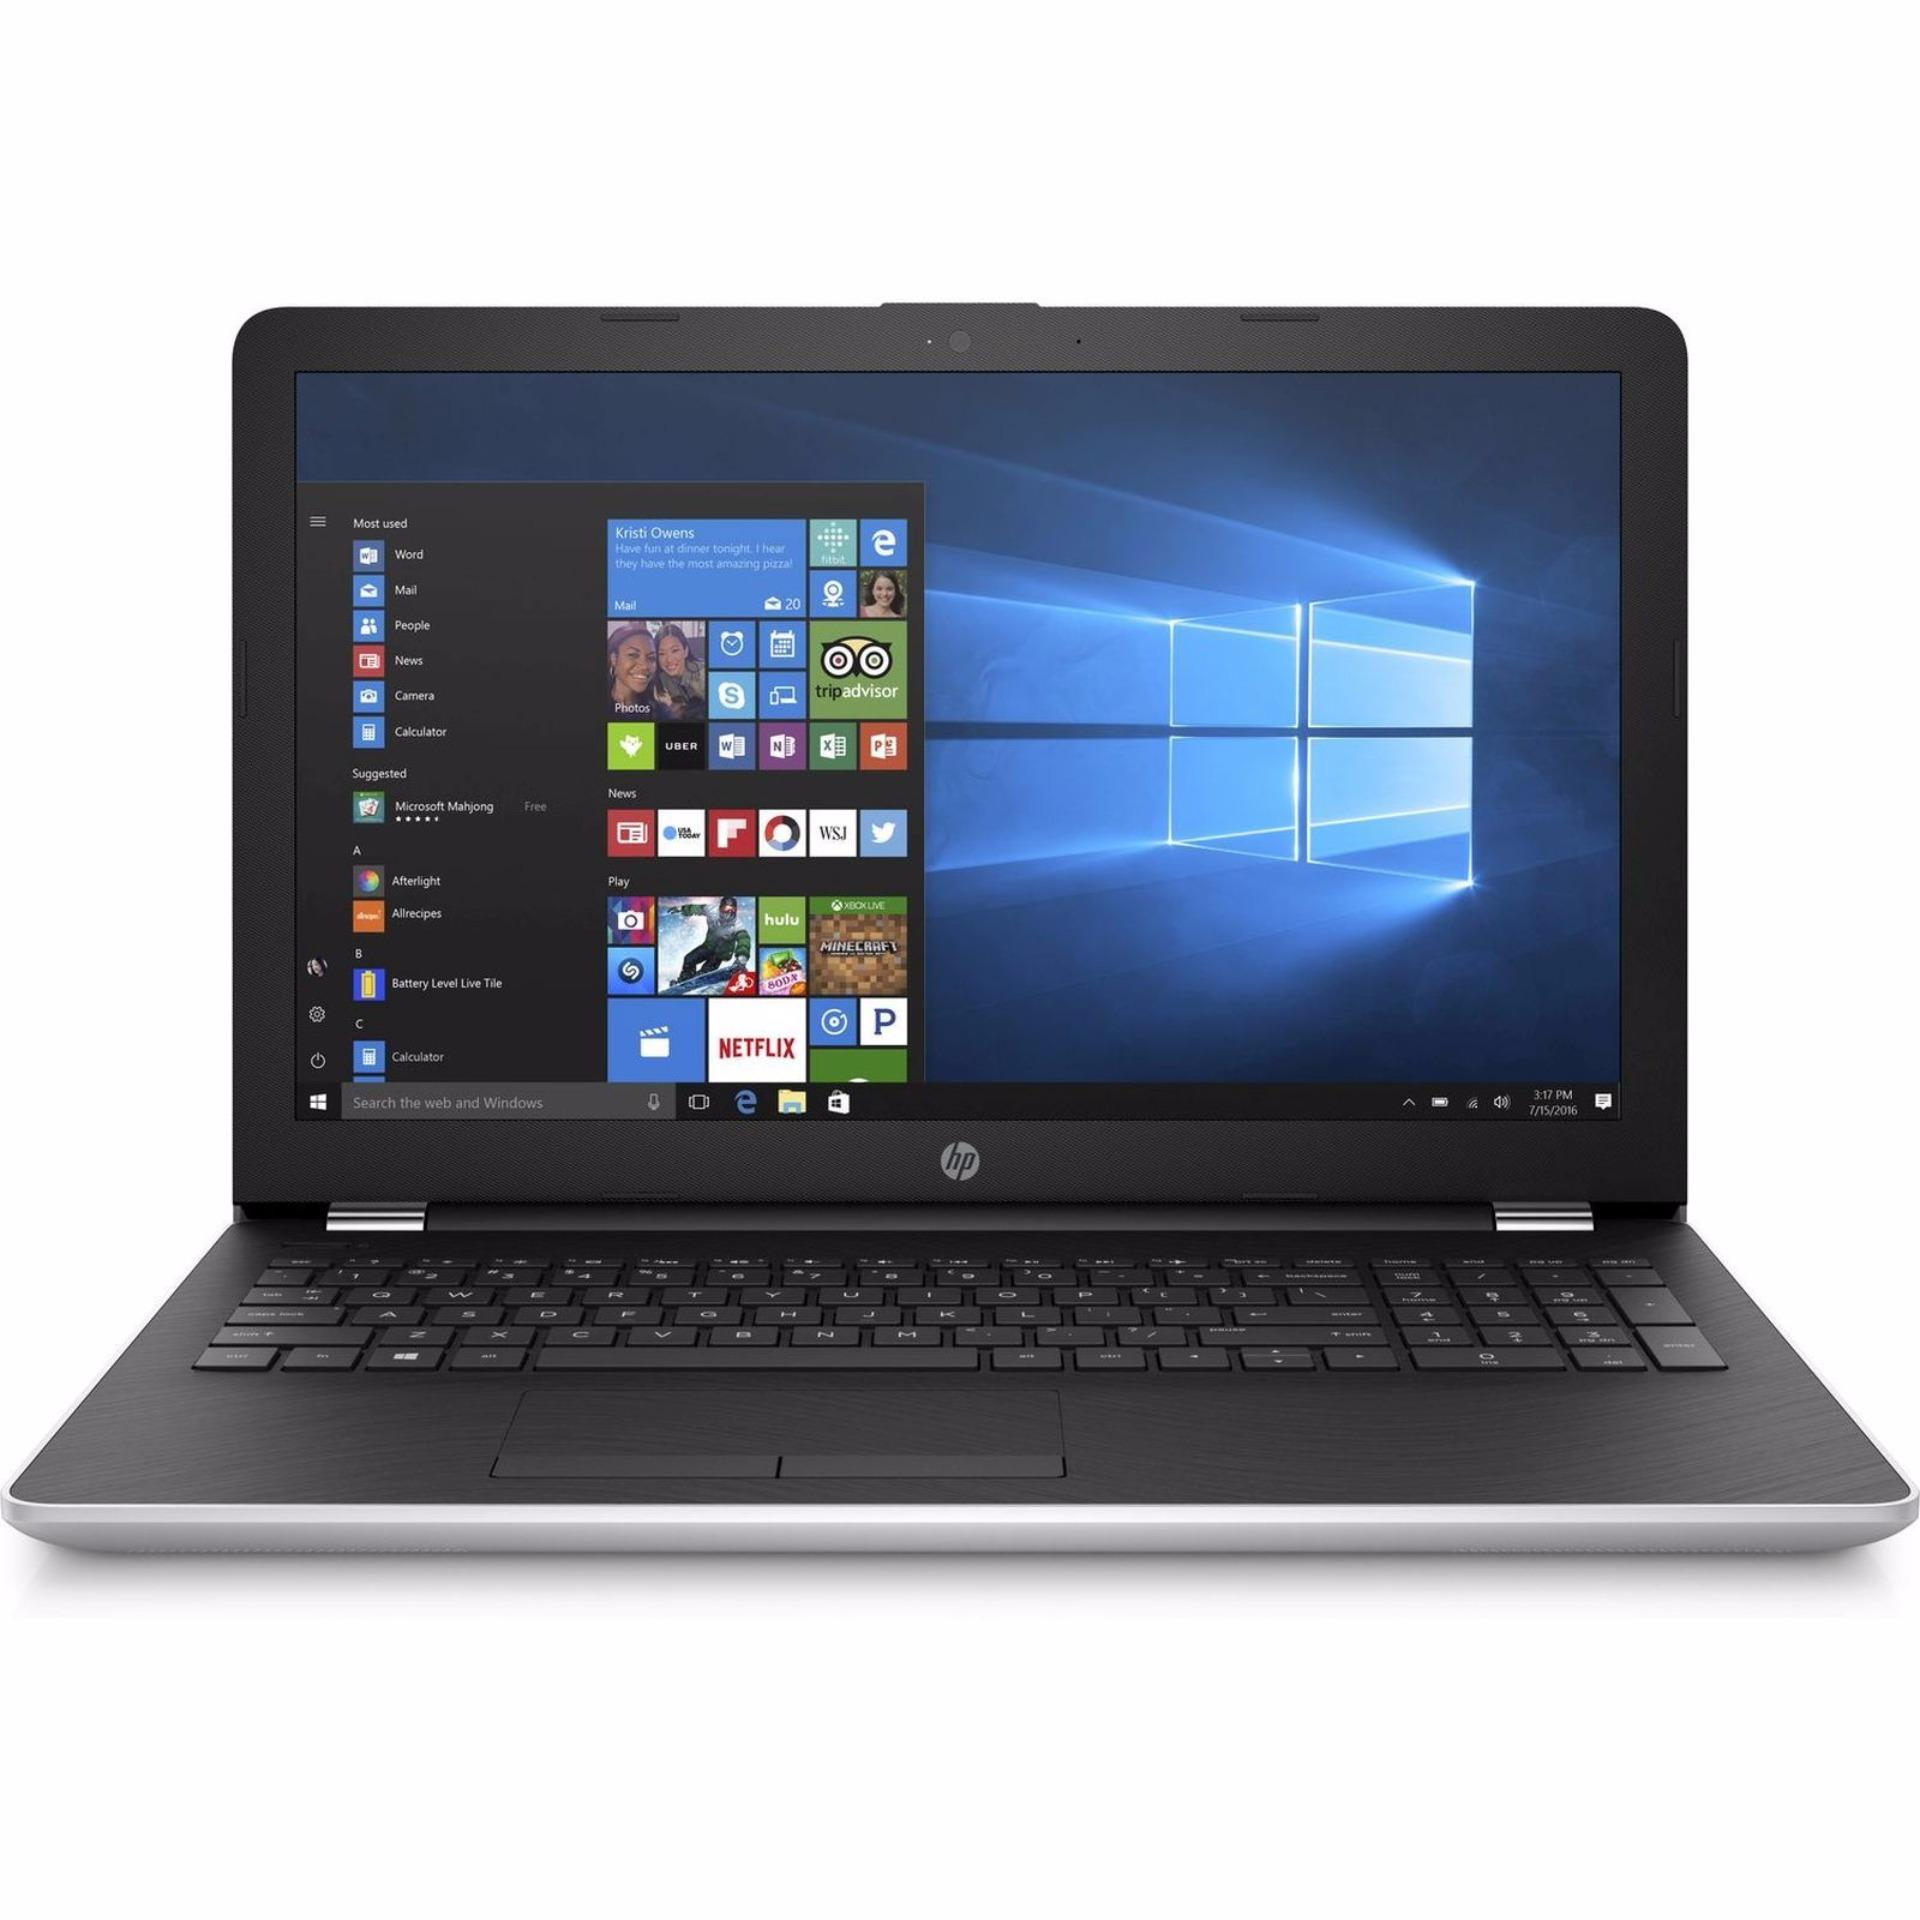 HP 15-BS100TX (2LS20PA) 15.6 IN INTEL CORE I5-8250U 8GB 1TB HDD WIN10